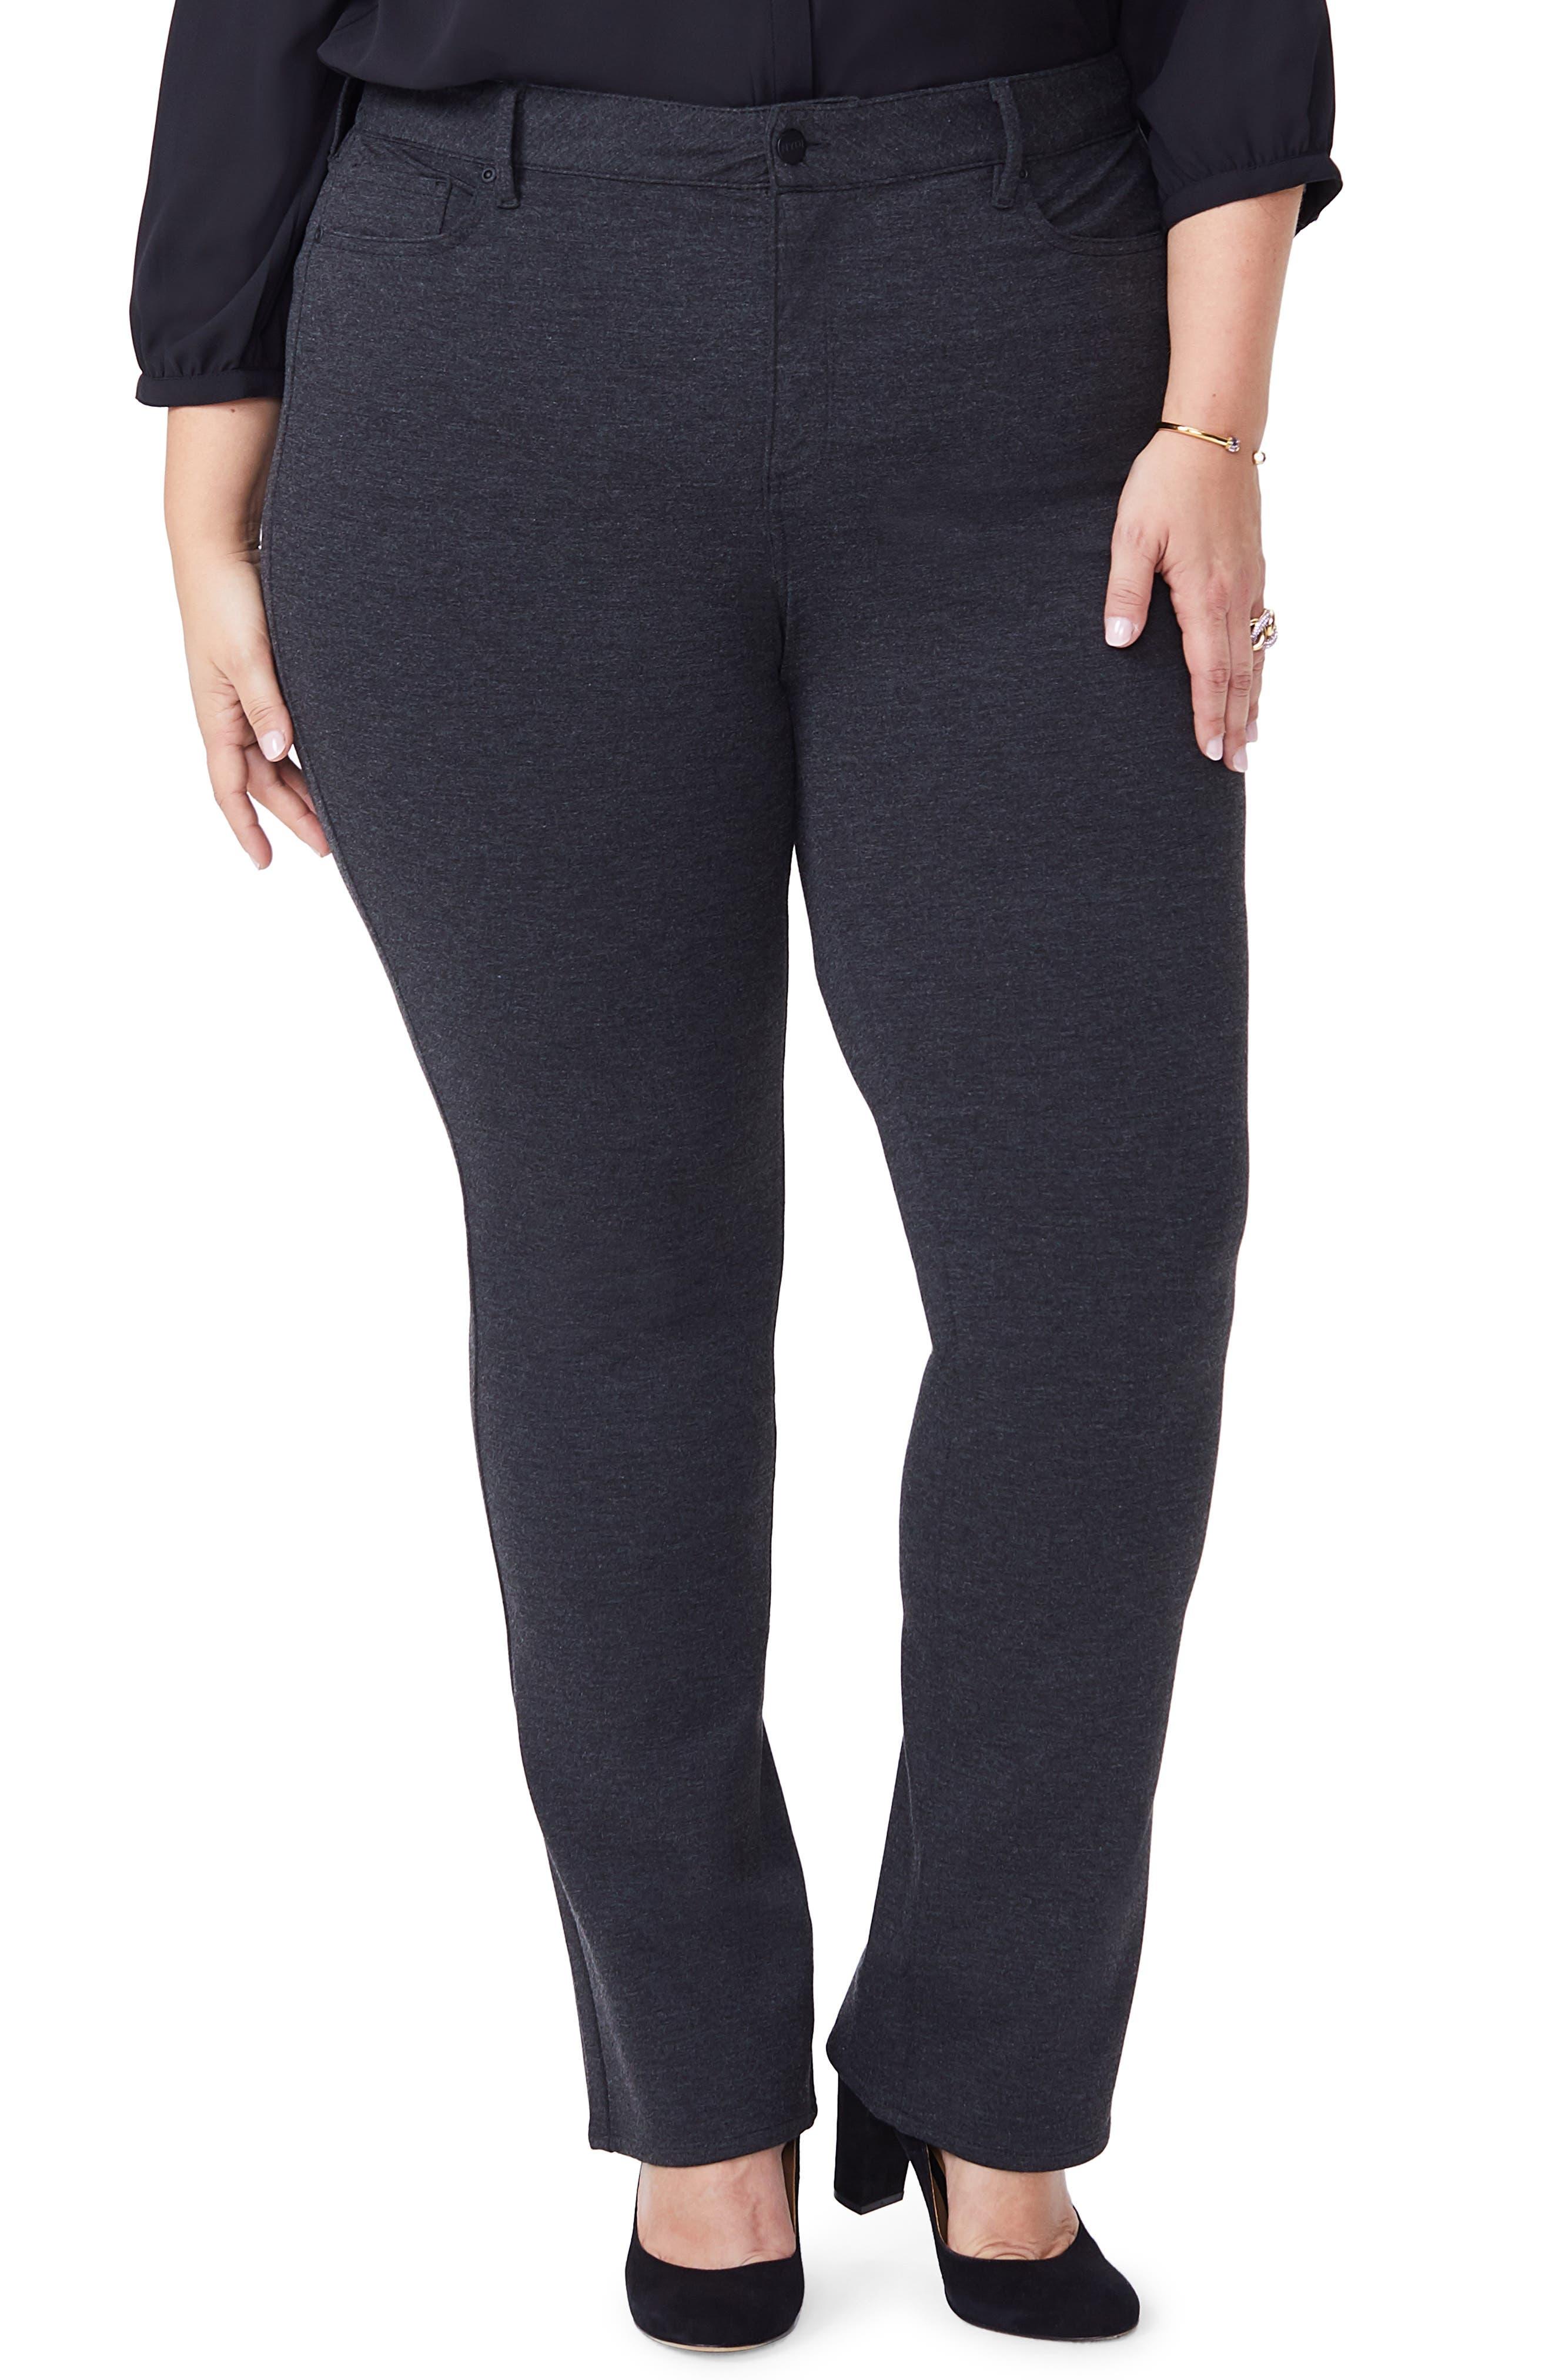 Plus Women's NYDJ Marilyn Straight Ponte Knit Pants